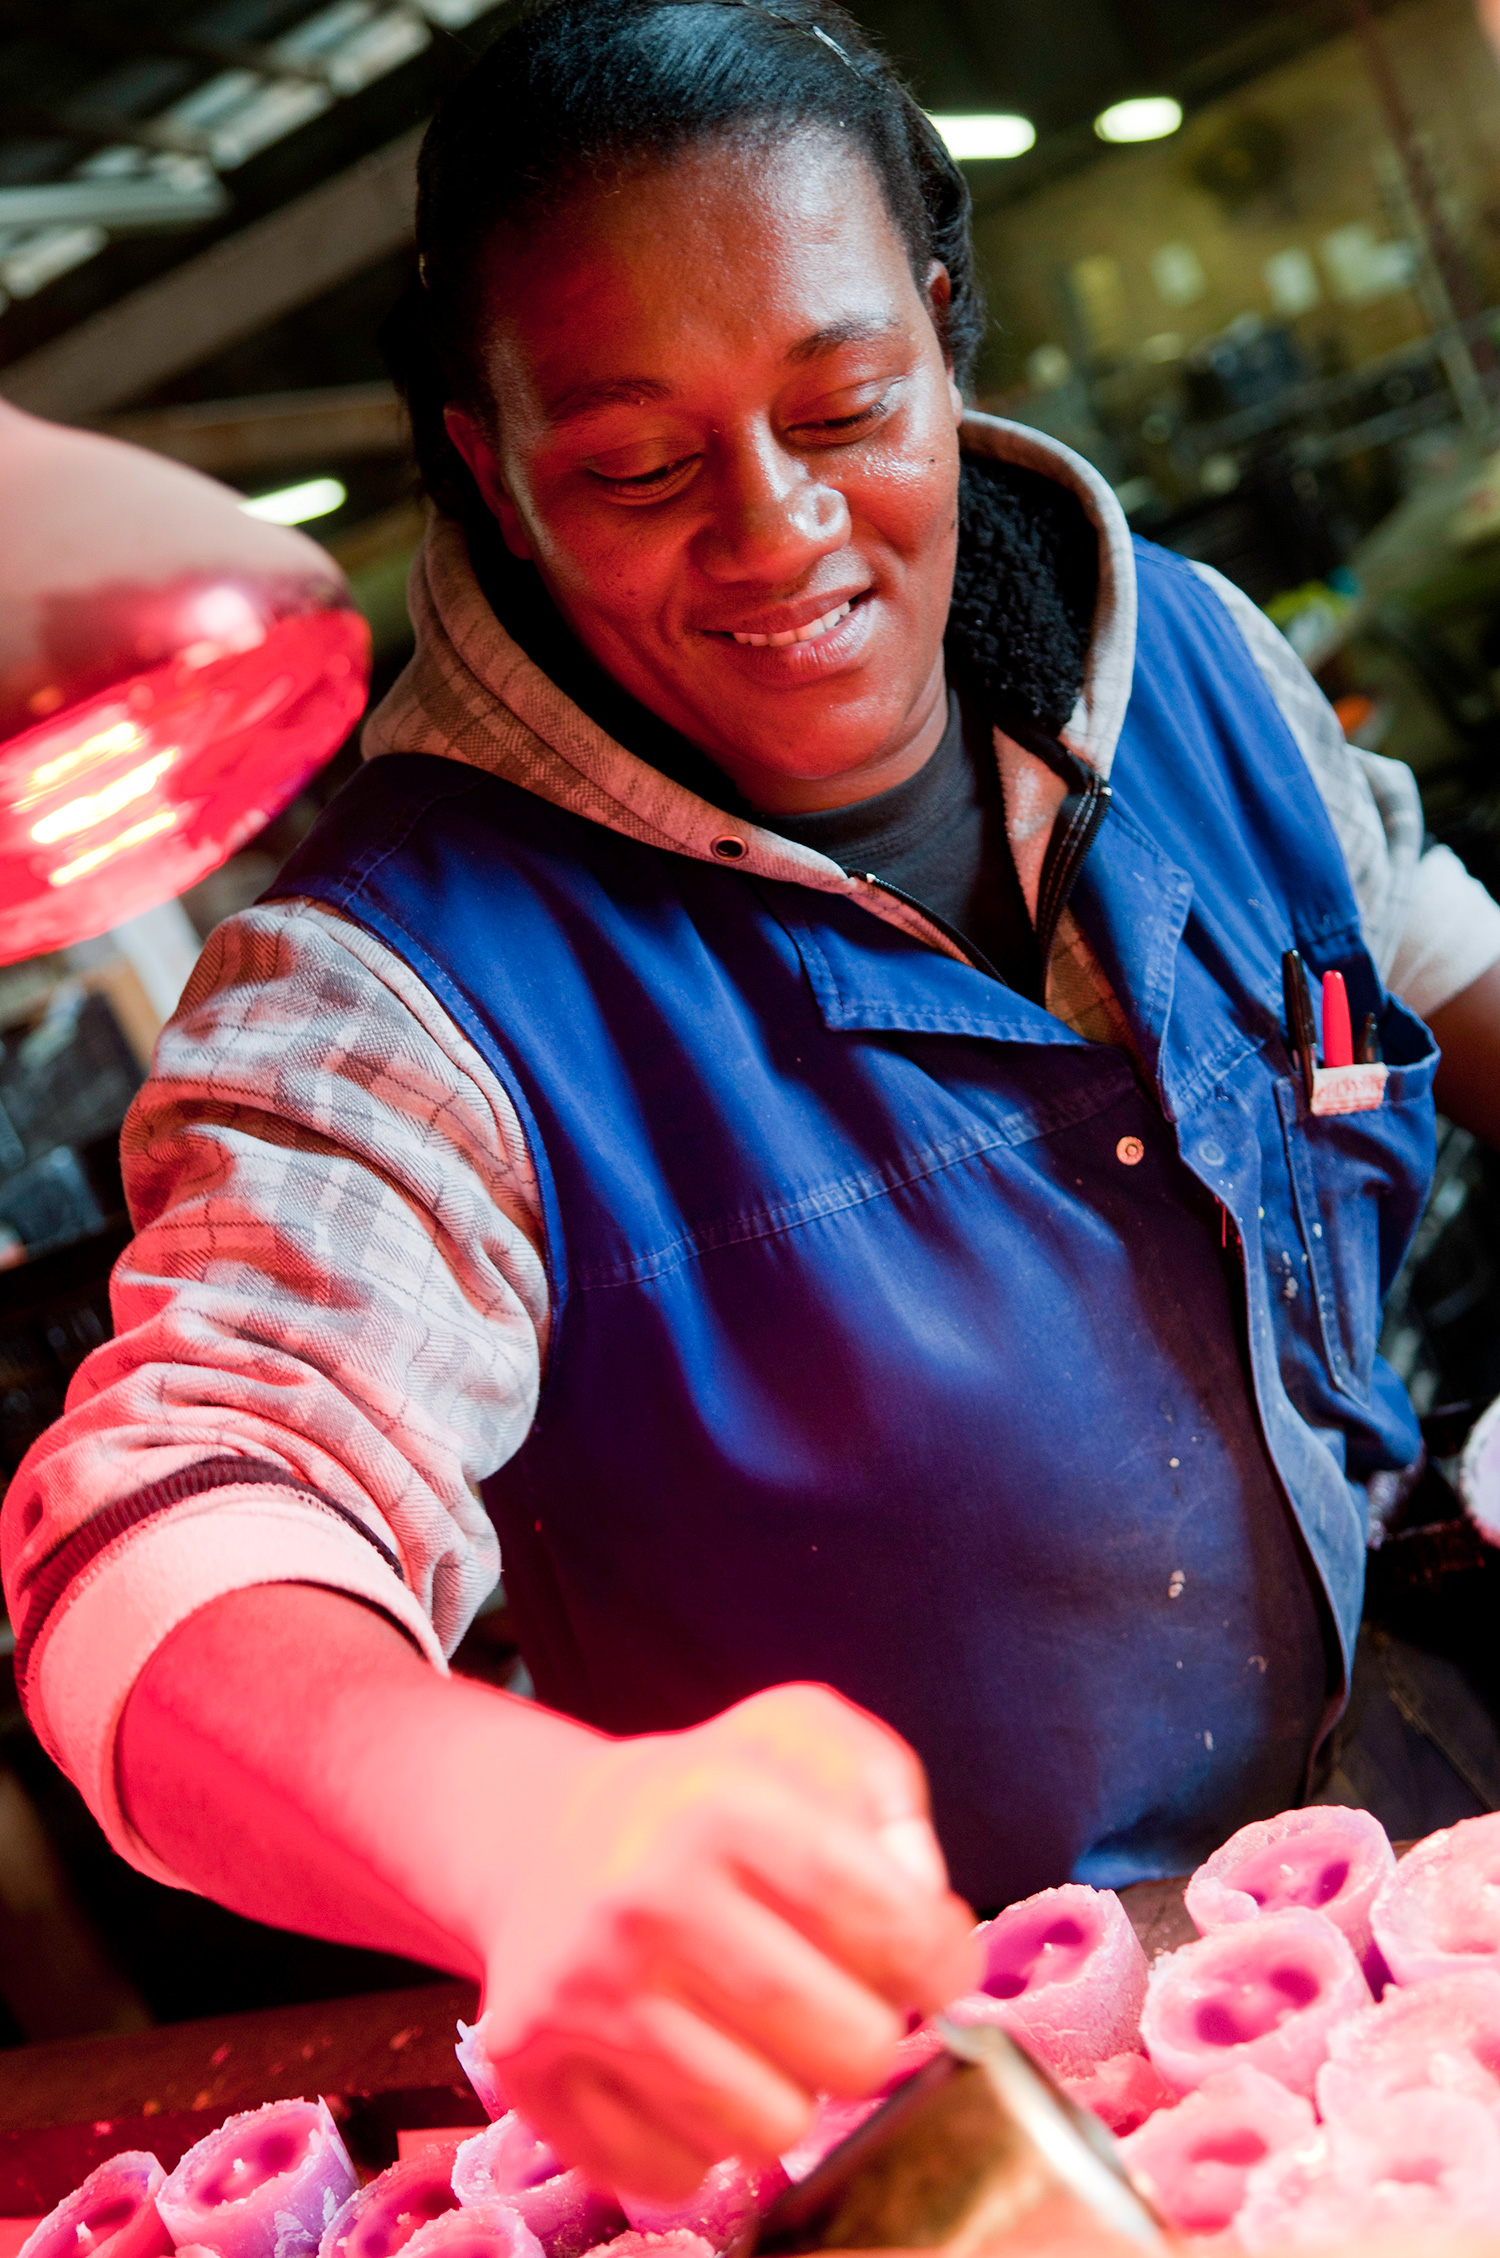 kapula-handmade-premium-fragranced-candles-wax-poured-woman.jpg